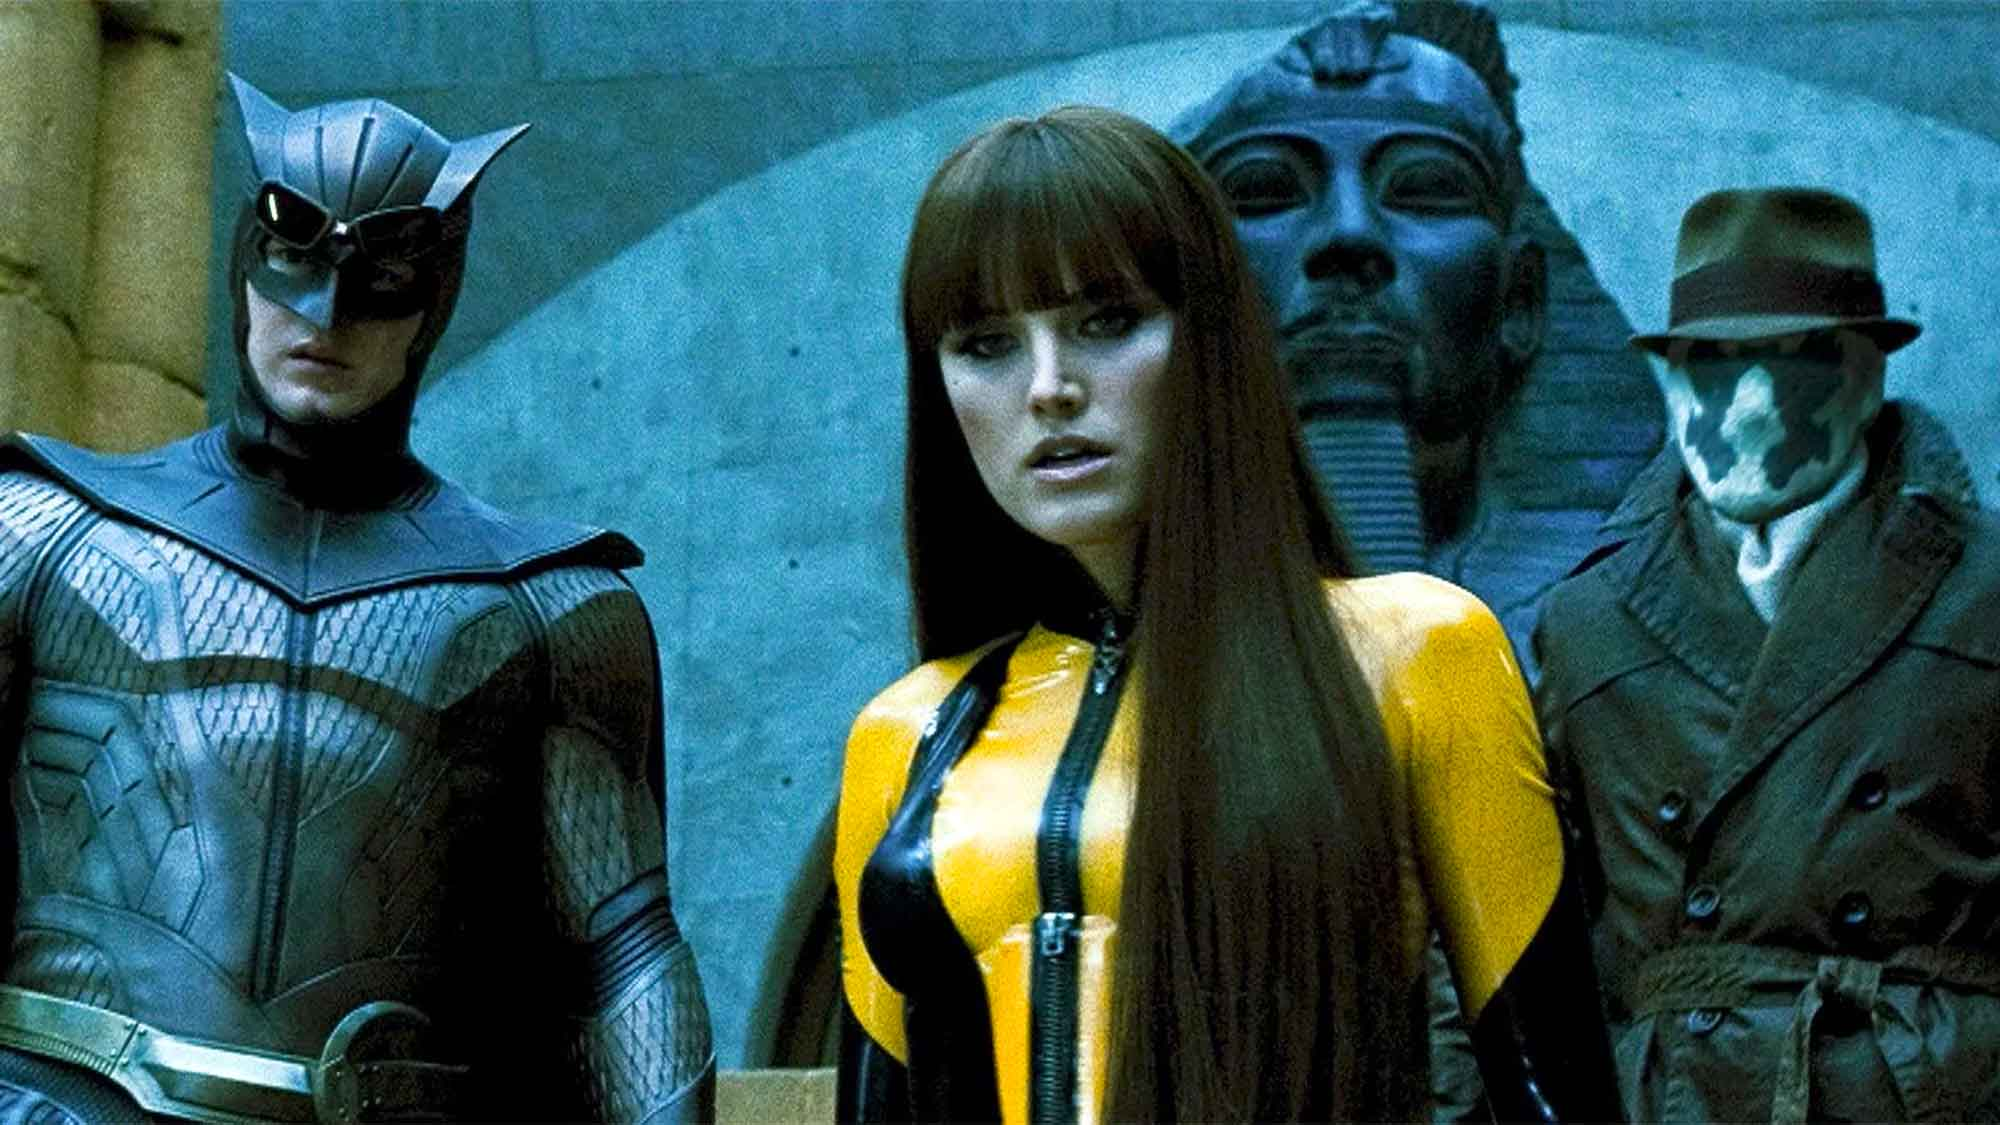 Watchmen Cast: Nite Owl, Silk Spectre II, and Rorschach